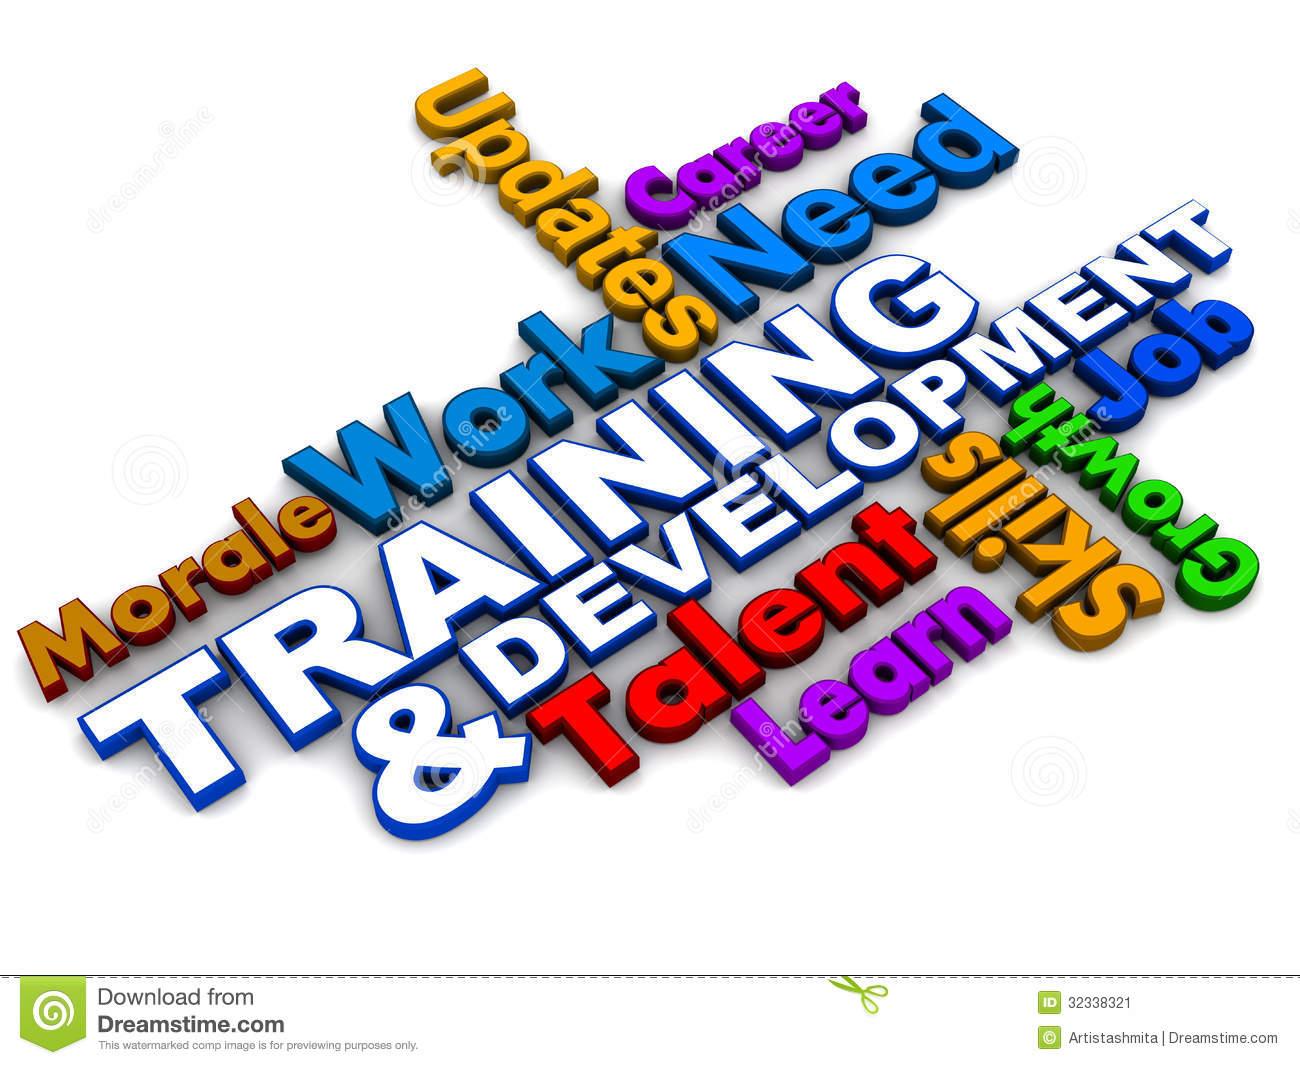 ... -training-clipart-training-and-development-words-AIQzWZ-clipart.jpg: www.clipartkid.com/training-and-development-cliparts